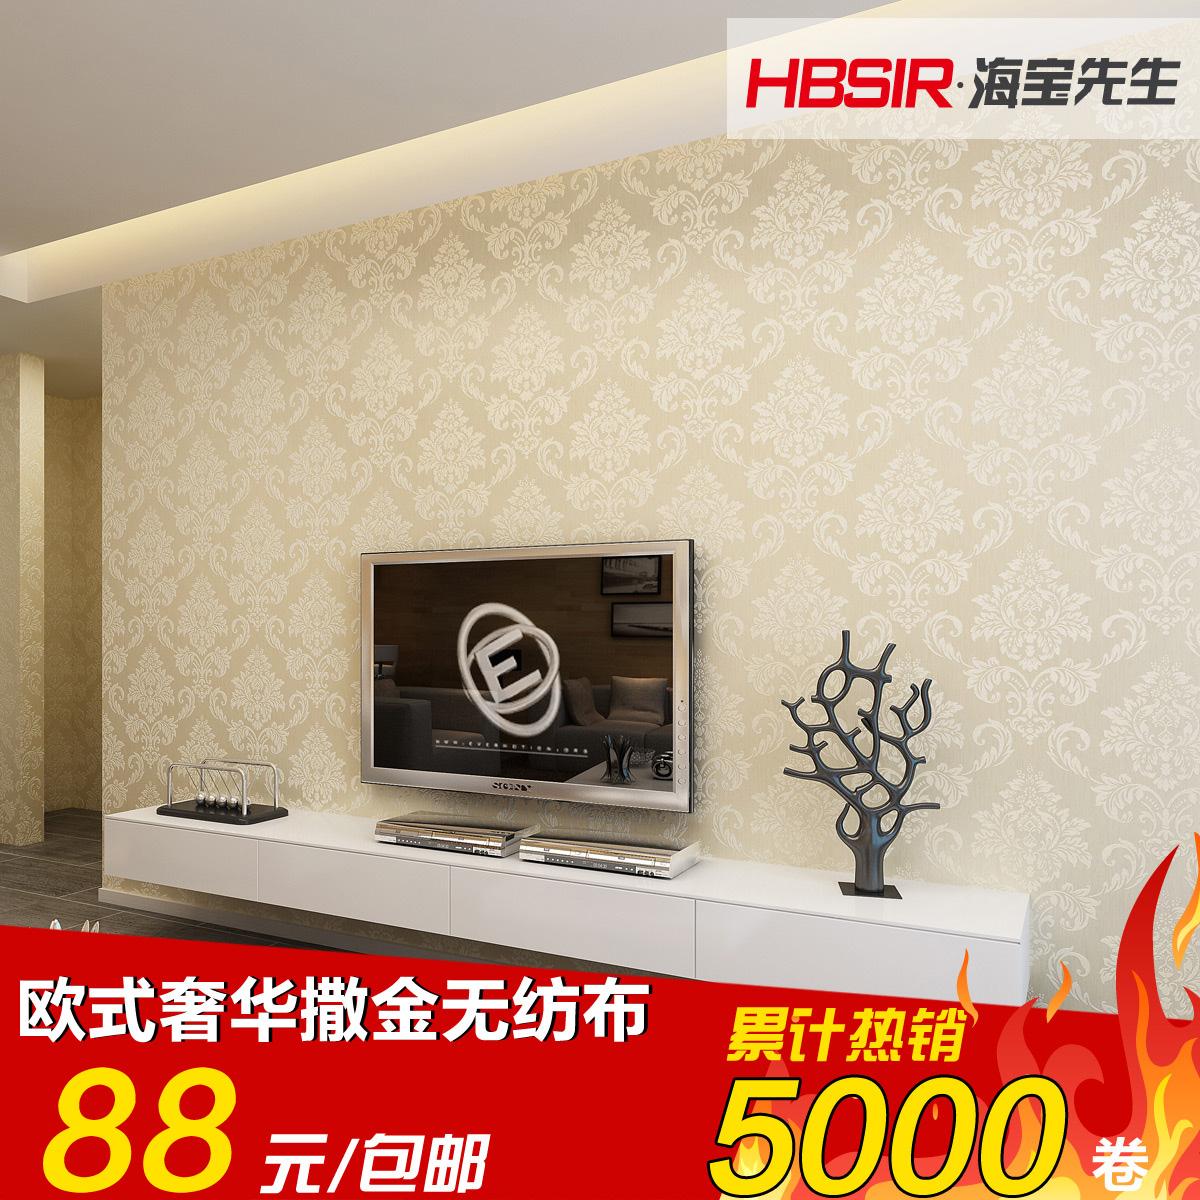 tv wand tapete m246bel design idee f252r sie gtgt latofucom